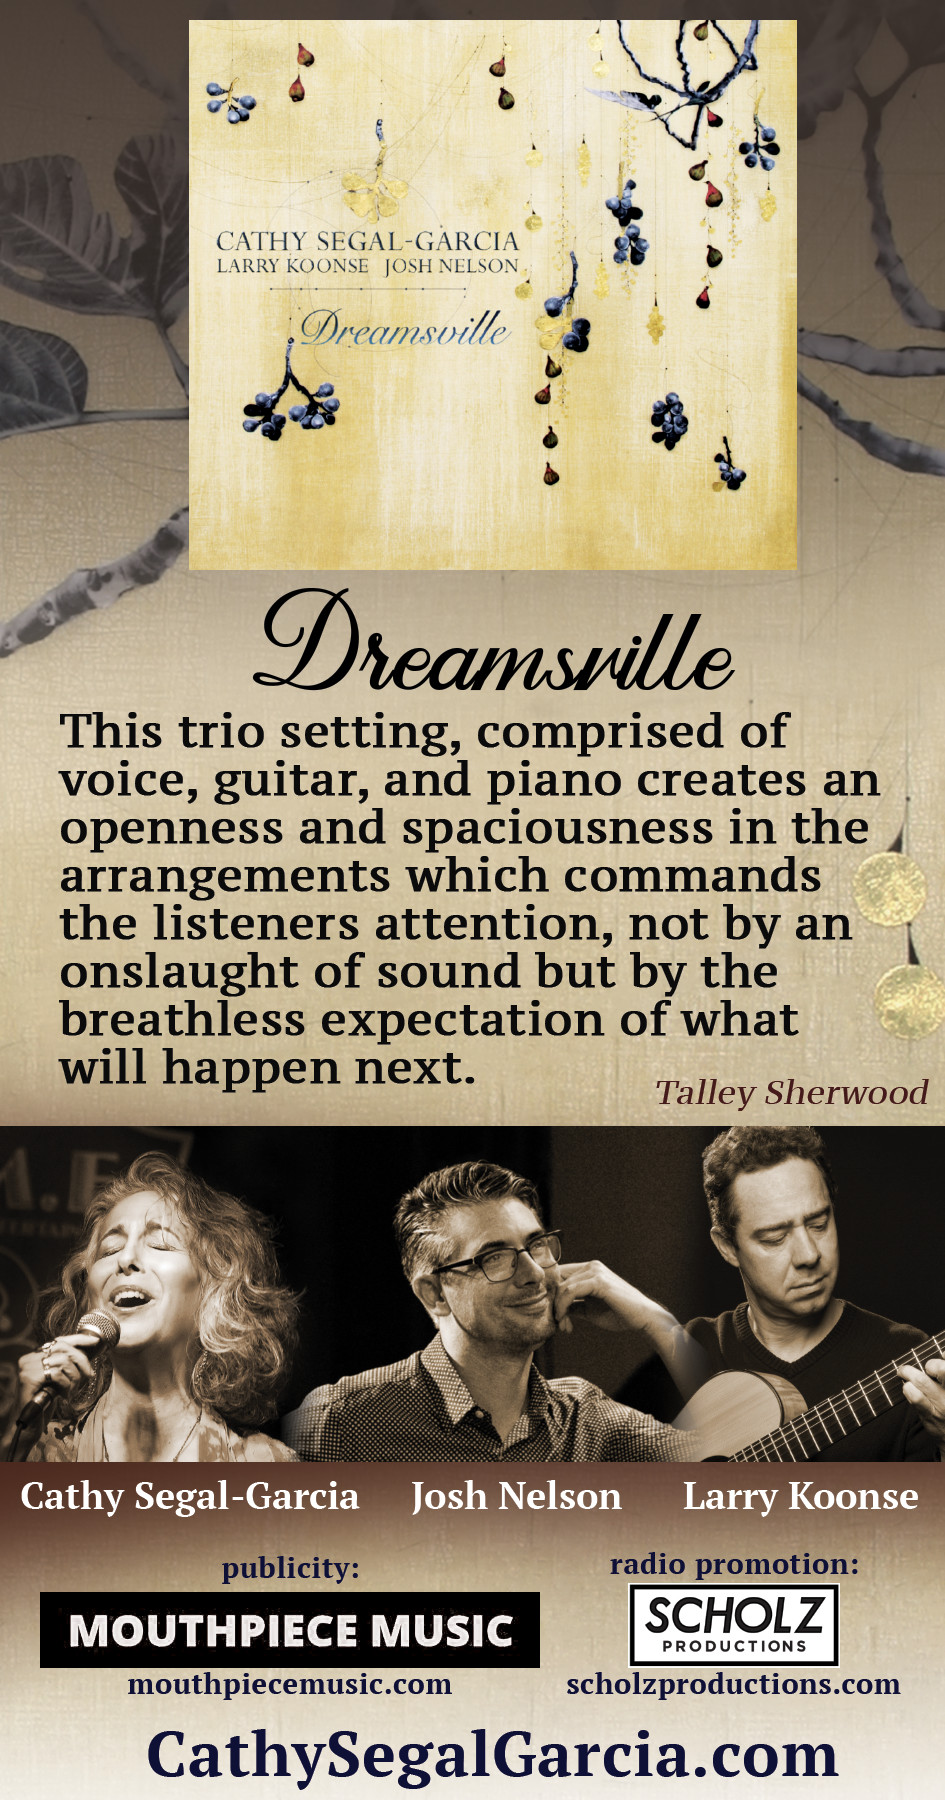 The NYC Jazz Record Dreamsville Ad